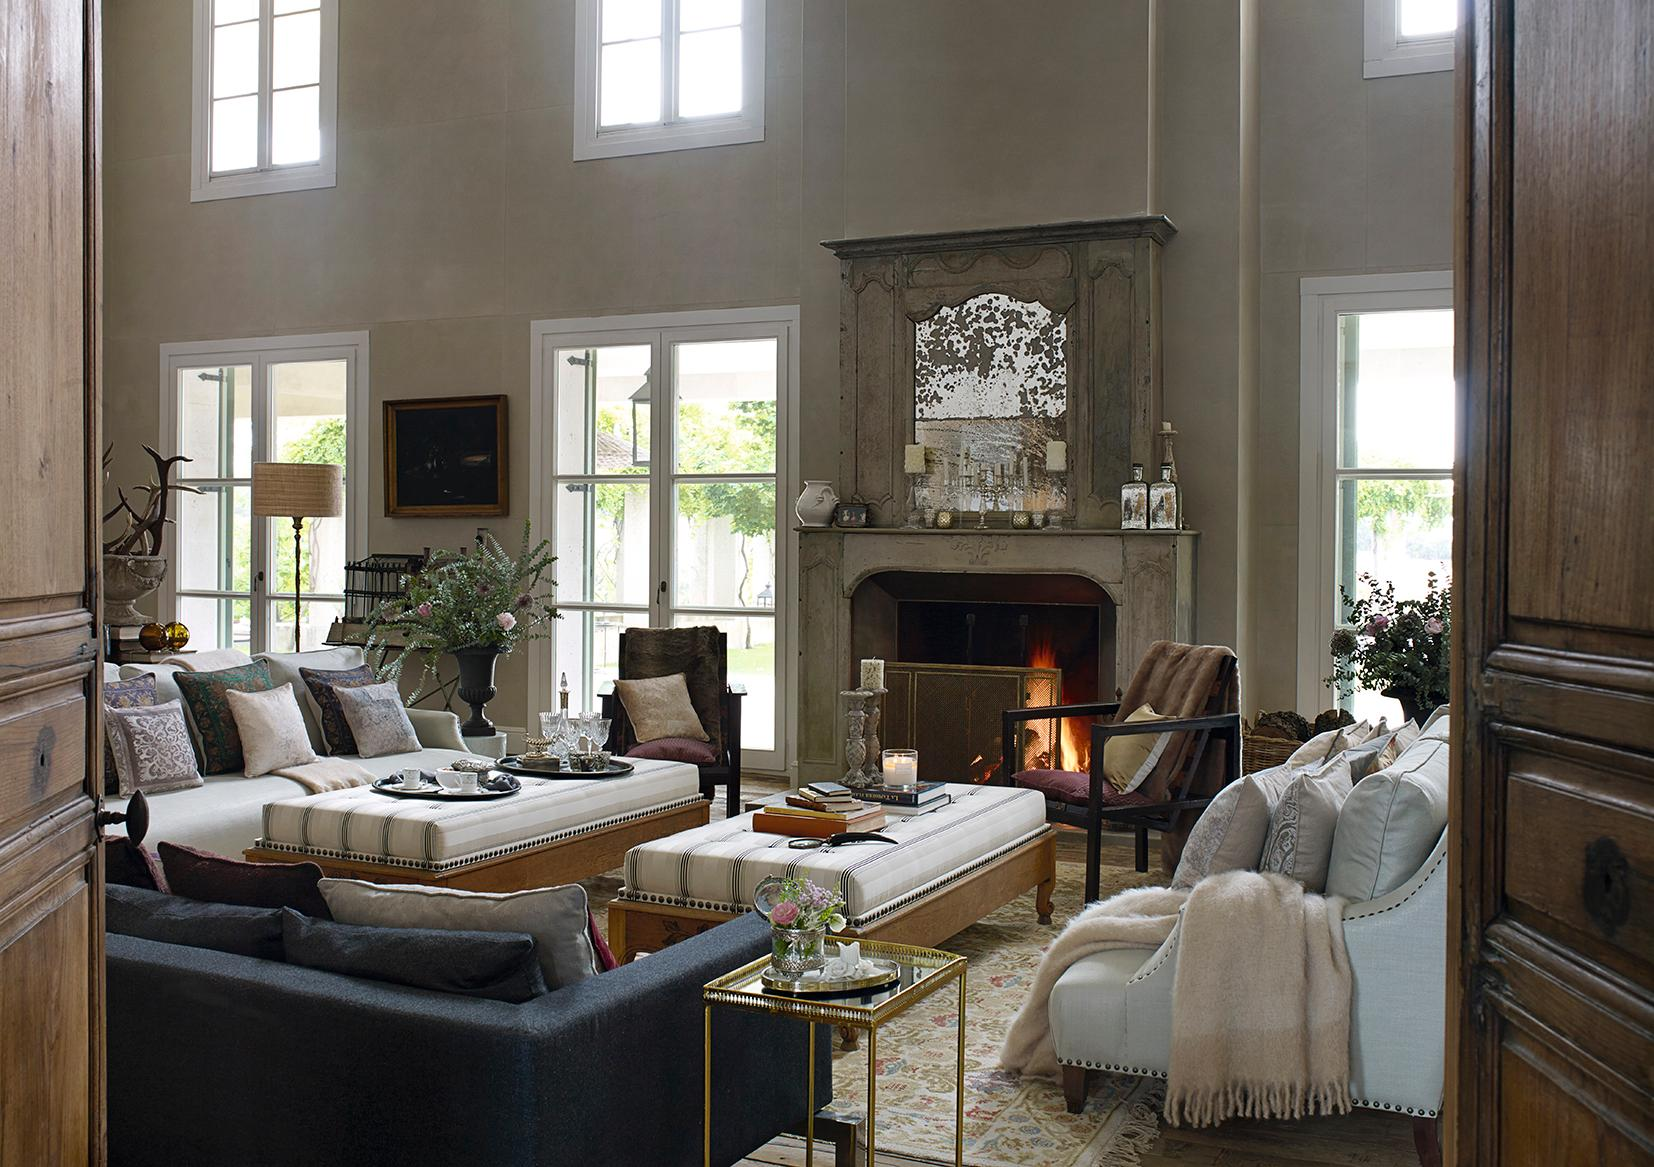 Sommerdeko bilder ideen couchstyle for Couchtisch zara